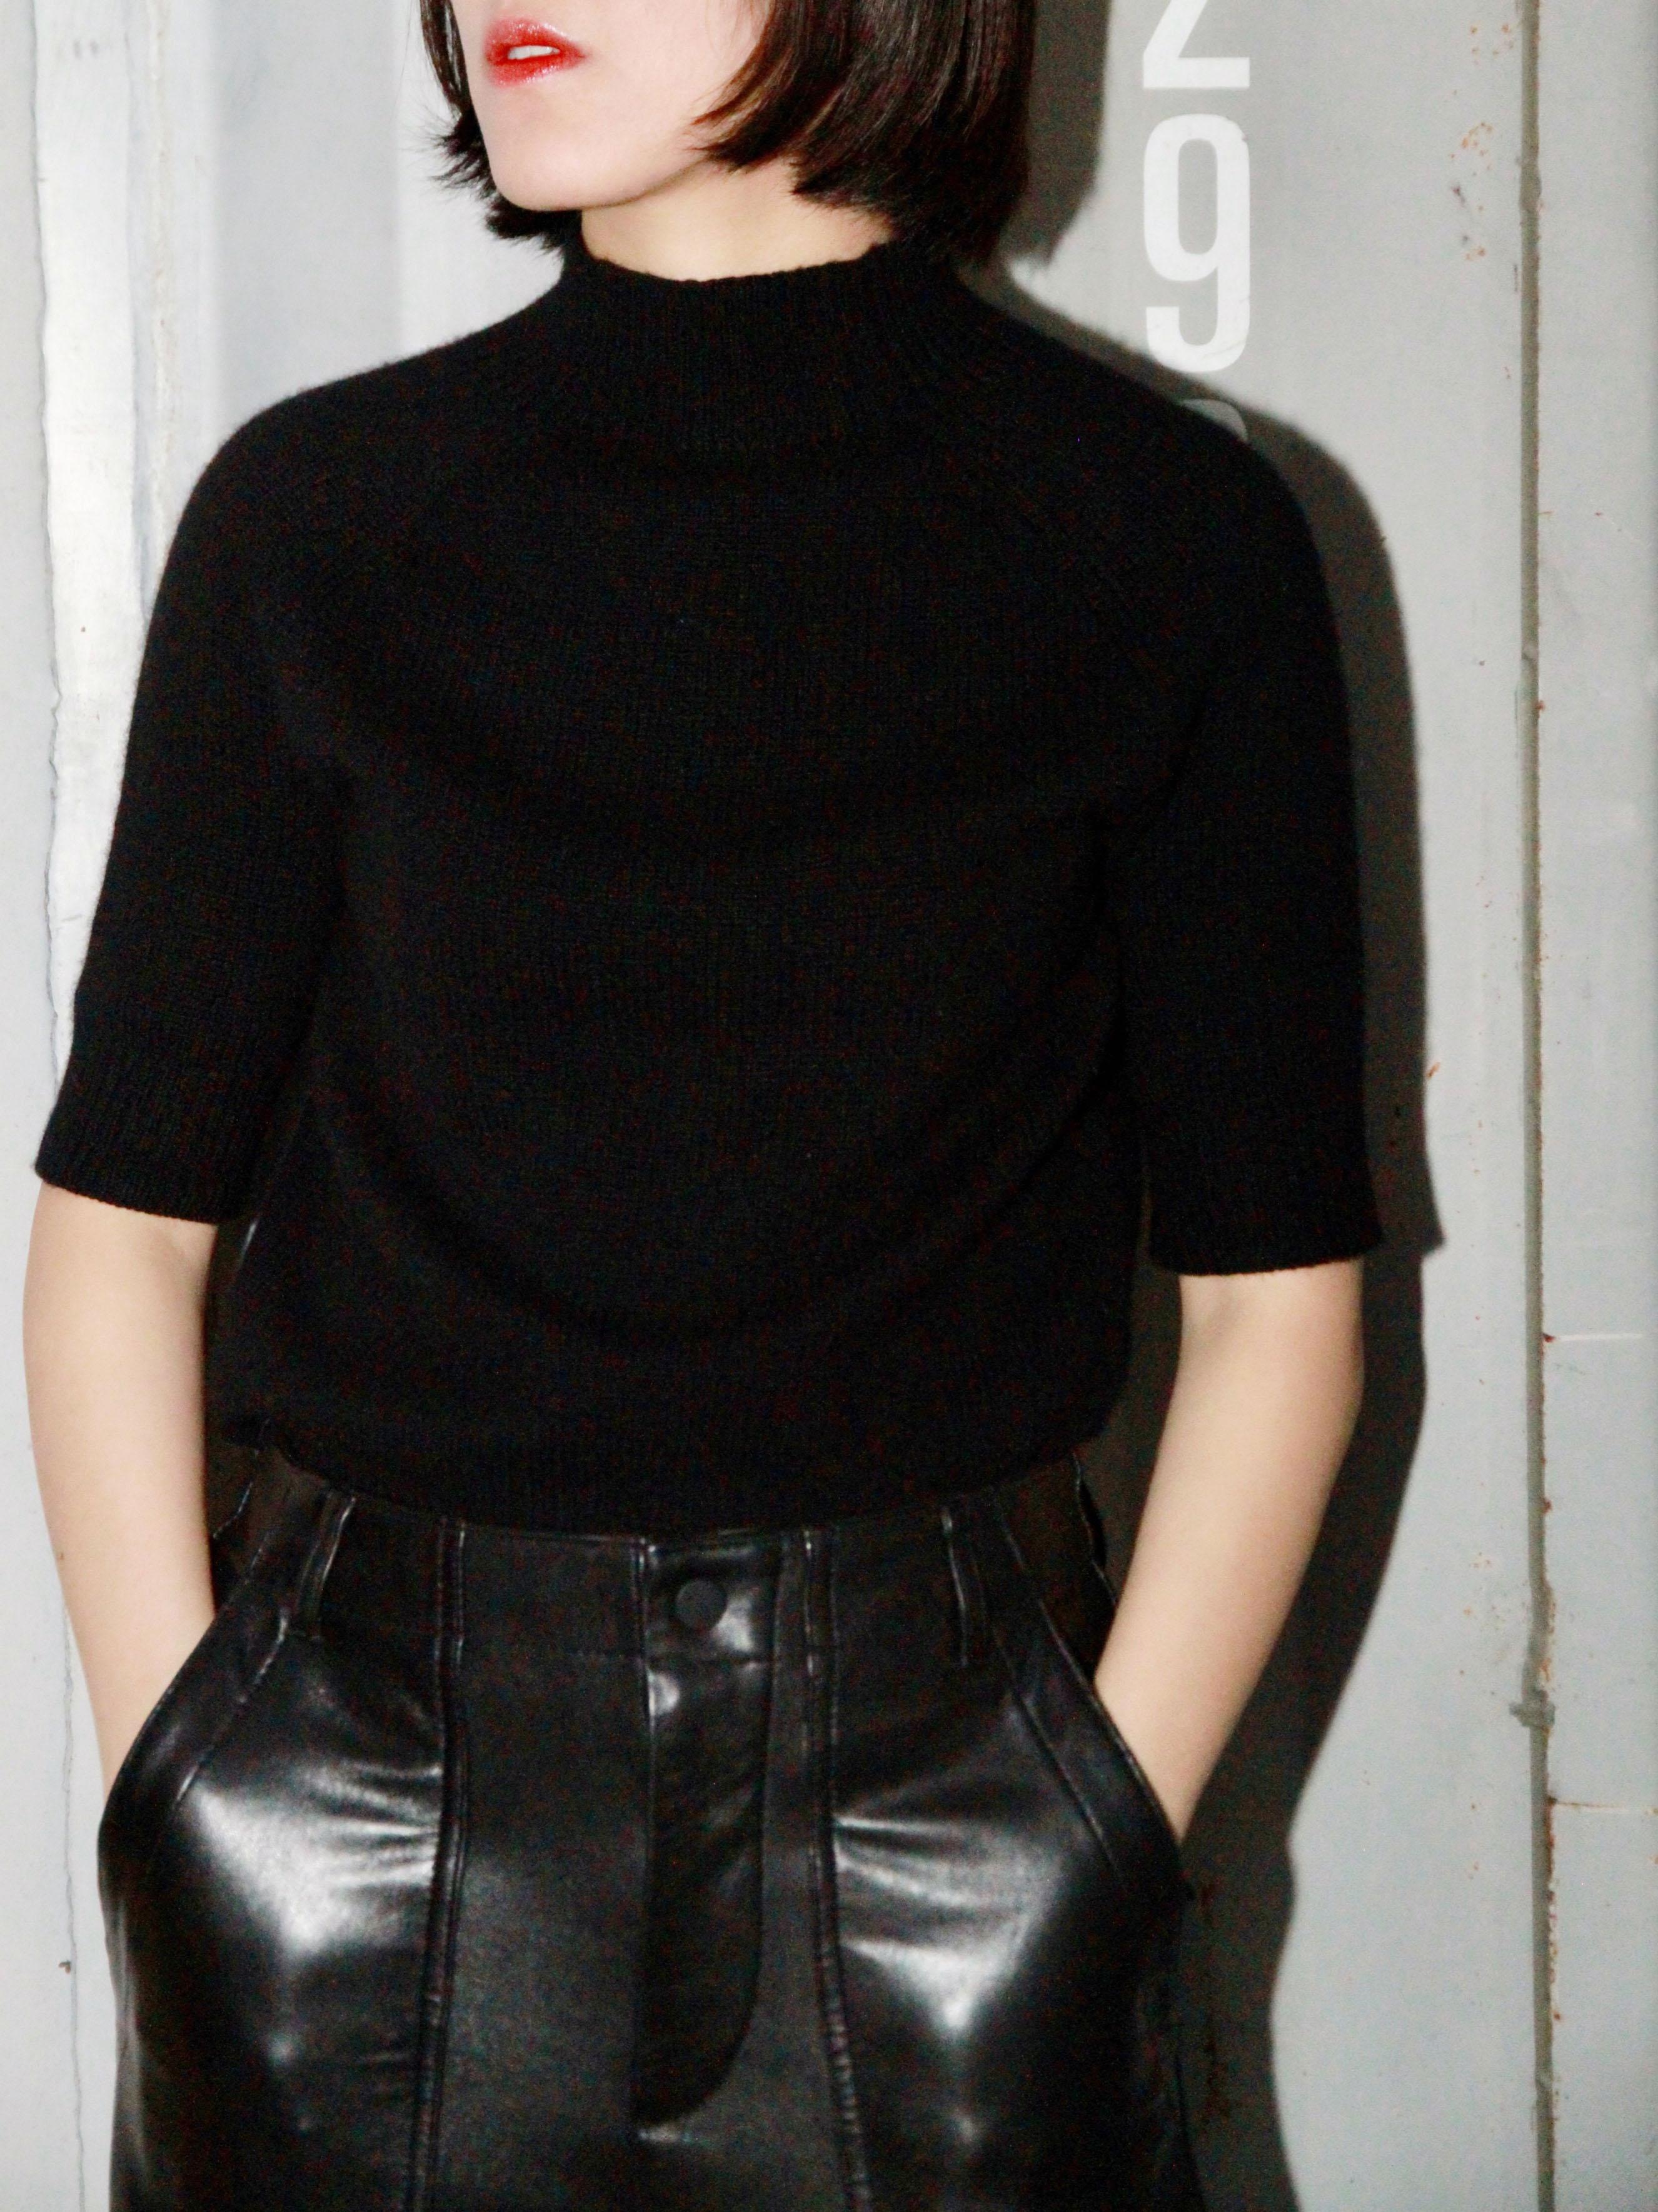 Range black and white medium sleeve designers minimalist workplace senior cool temperament